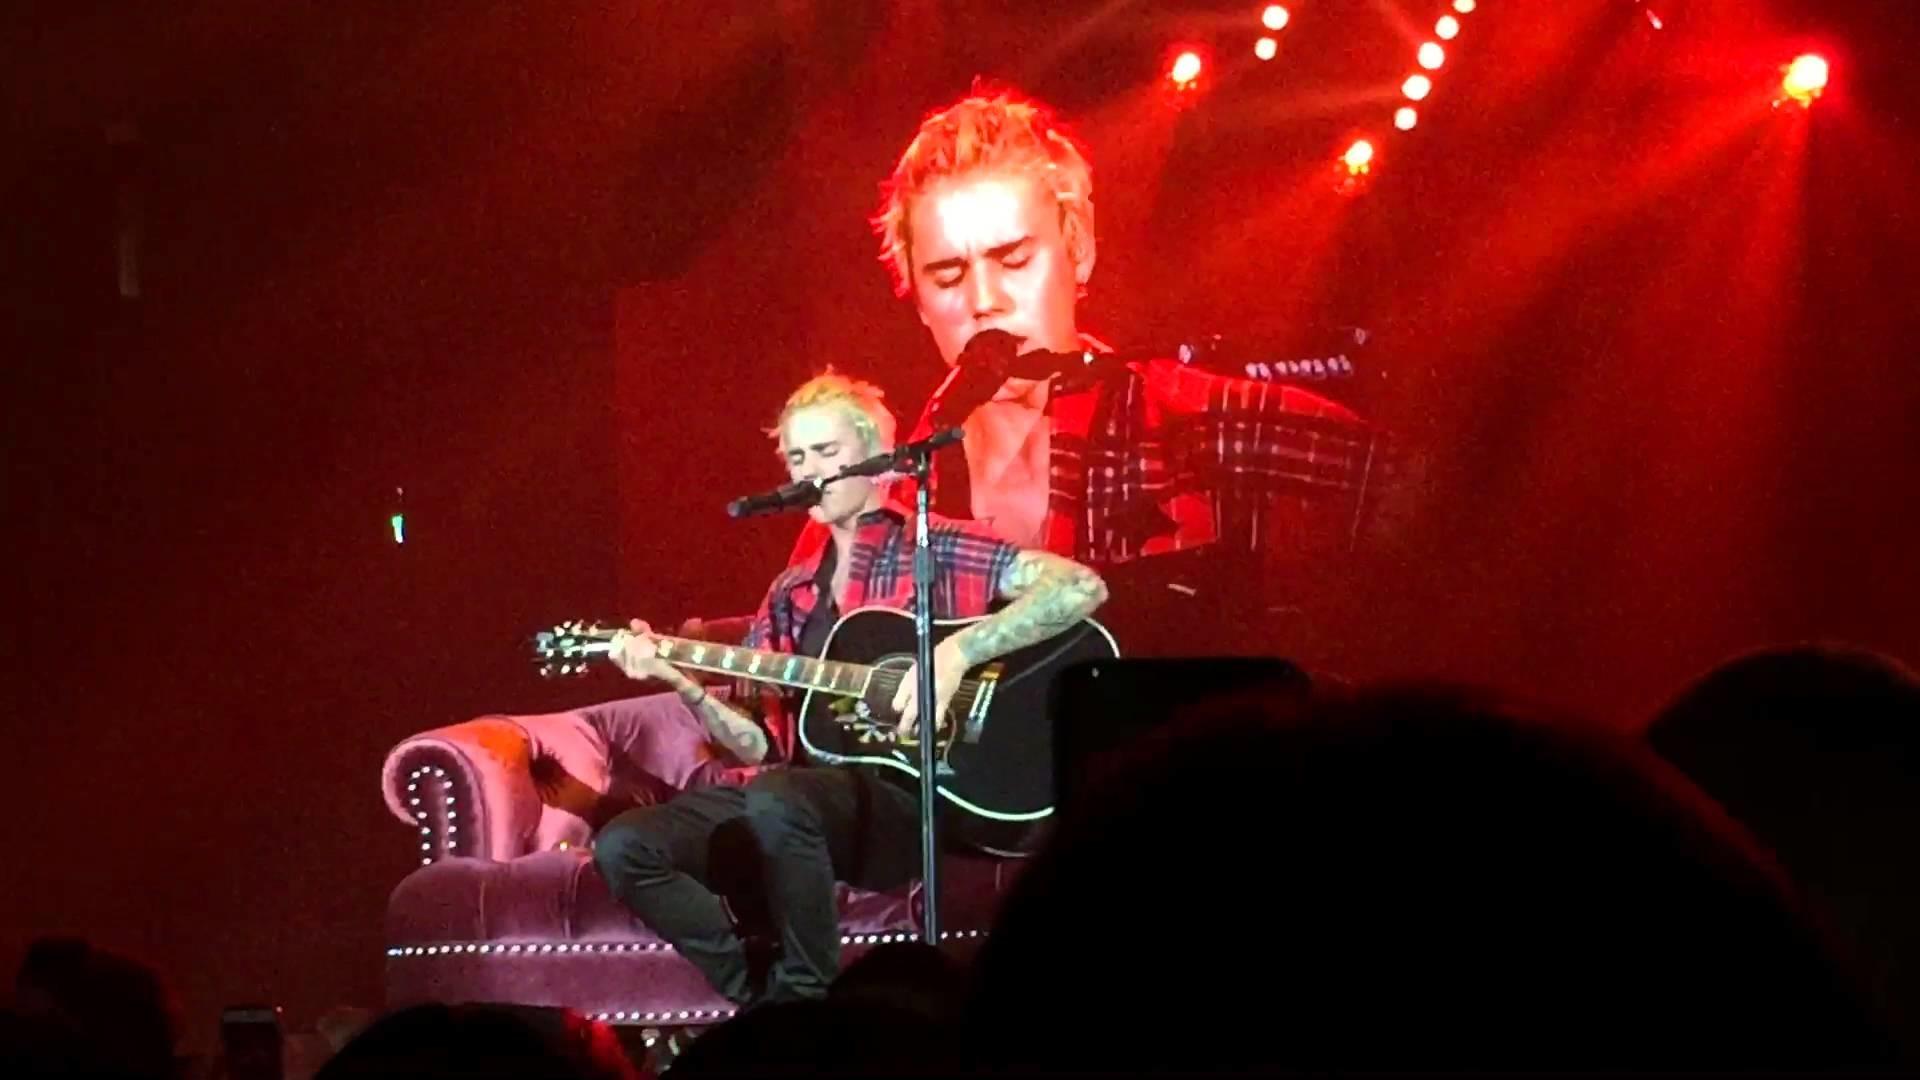 Justin Bieber Purpose Wallpapers 66 Images